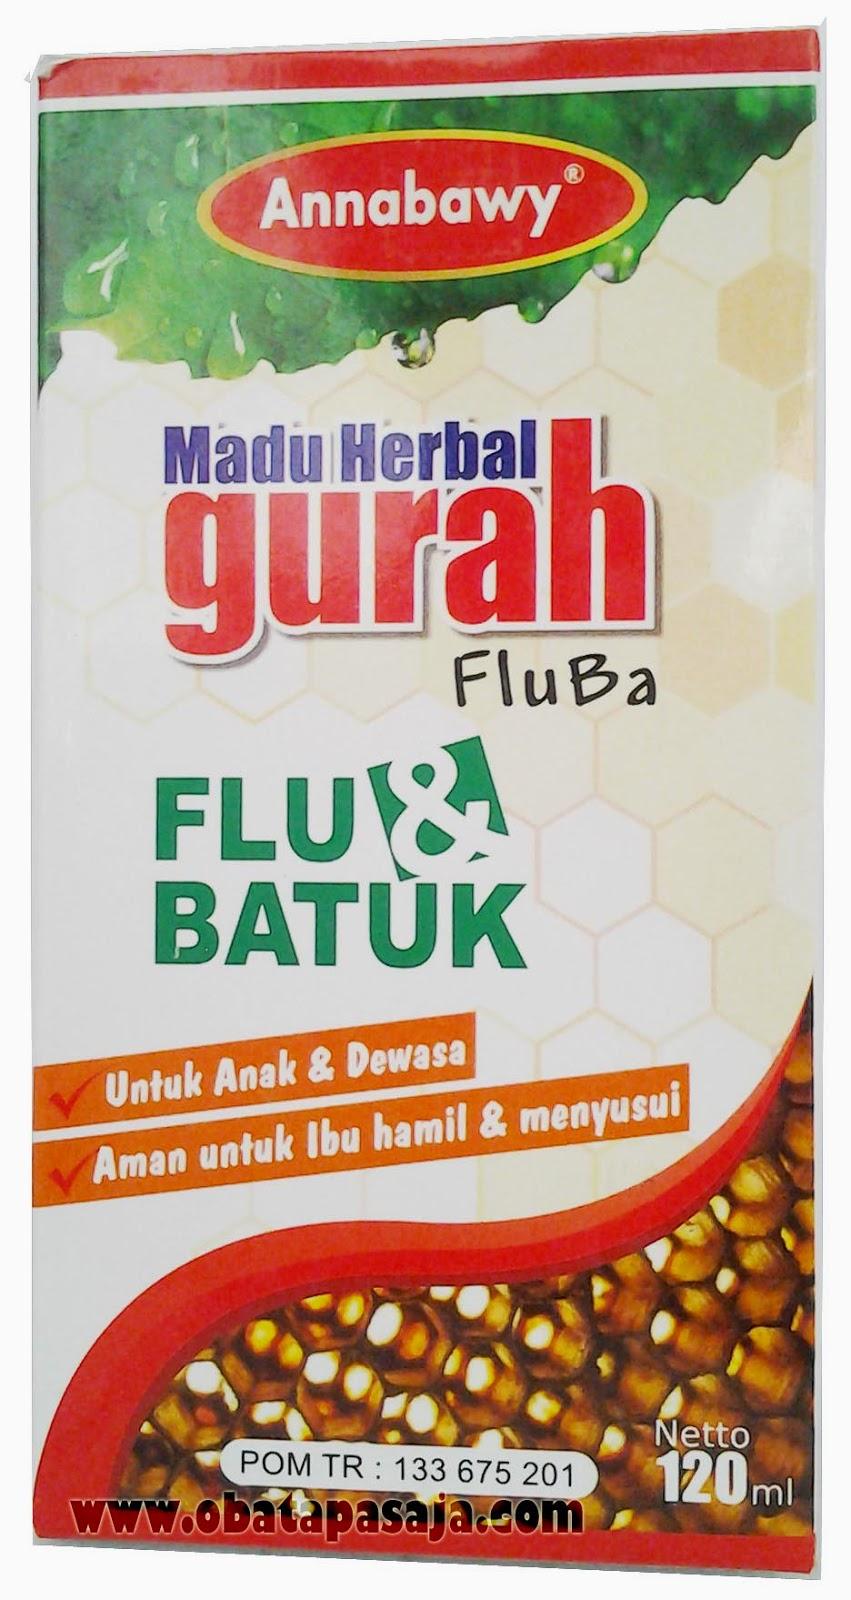 Khasiat Madu Herbal Gurah FluBa Annabawy